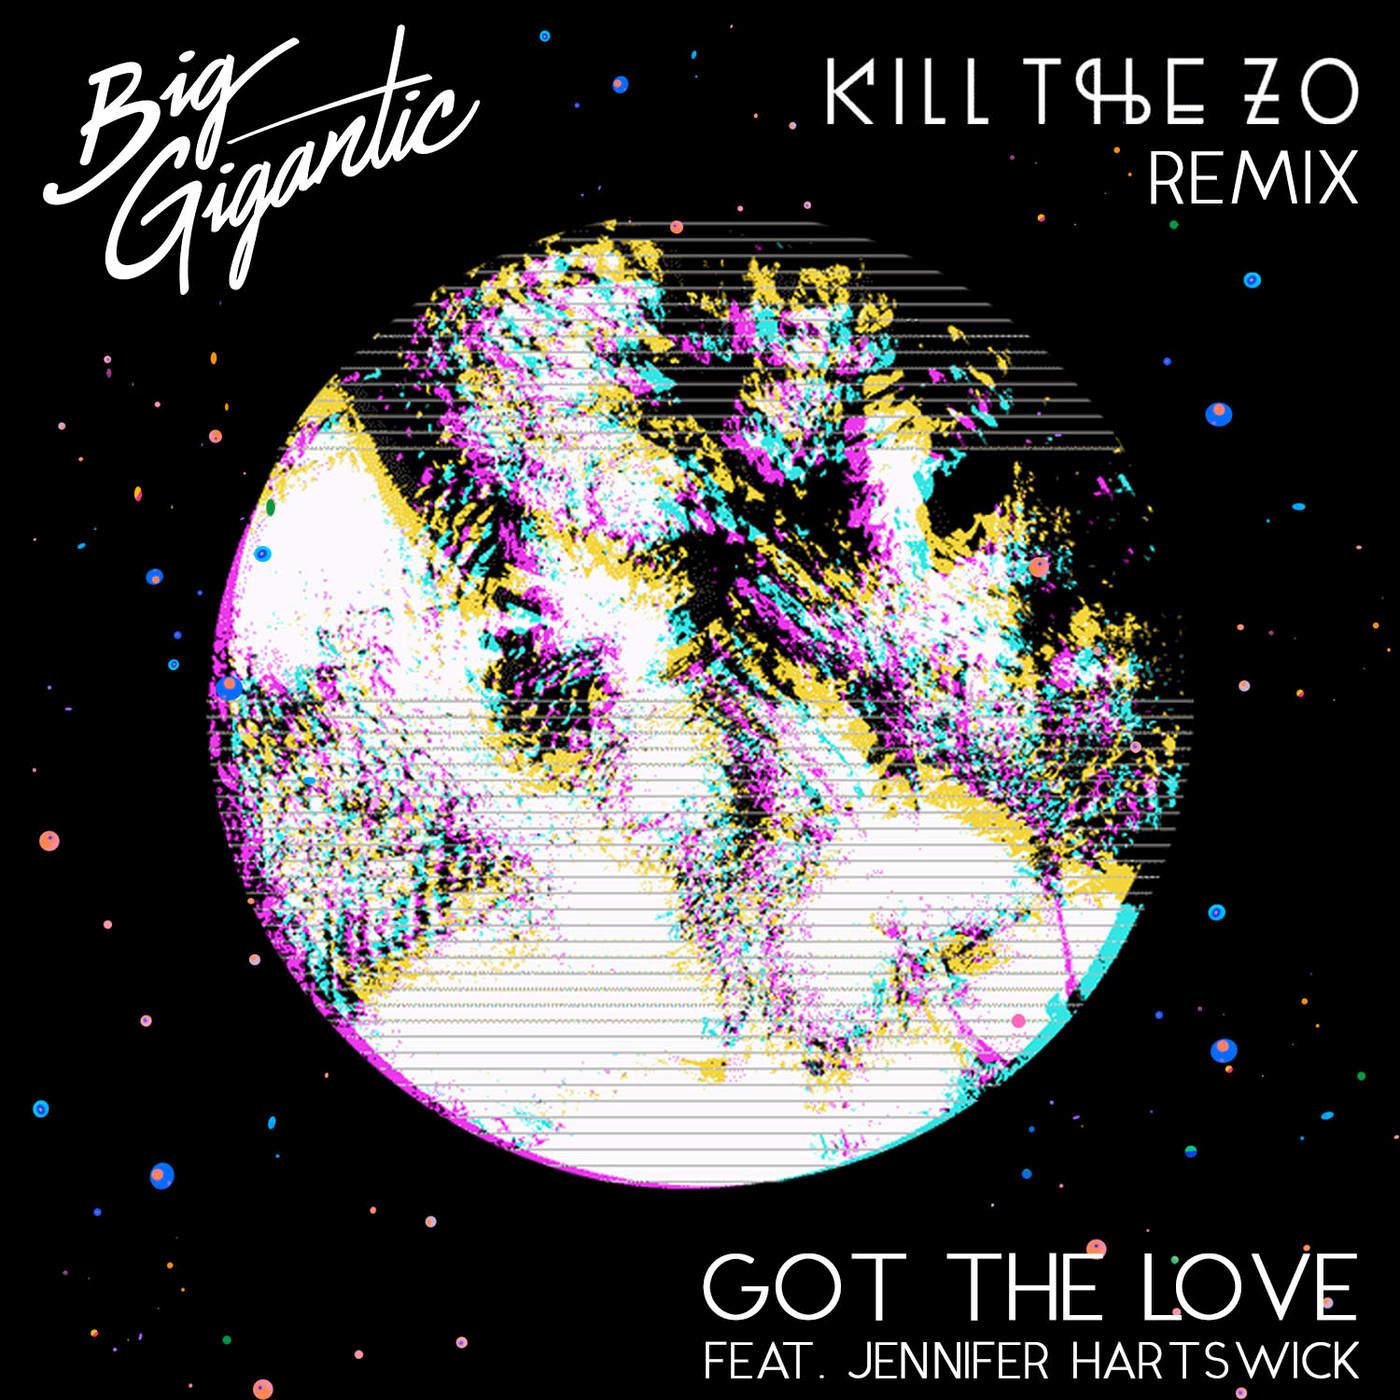 Big Gigantic, Kill the Noise & Mat Zo - Got the Love (feat. Jennifer Hartswick) [Kill the Zo Remix] - Single